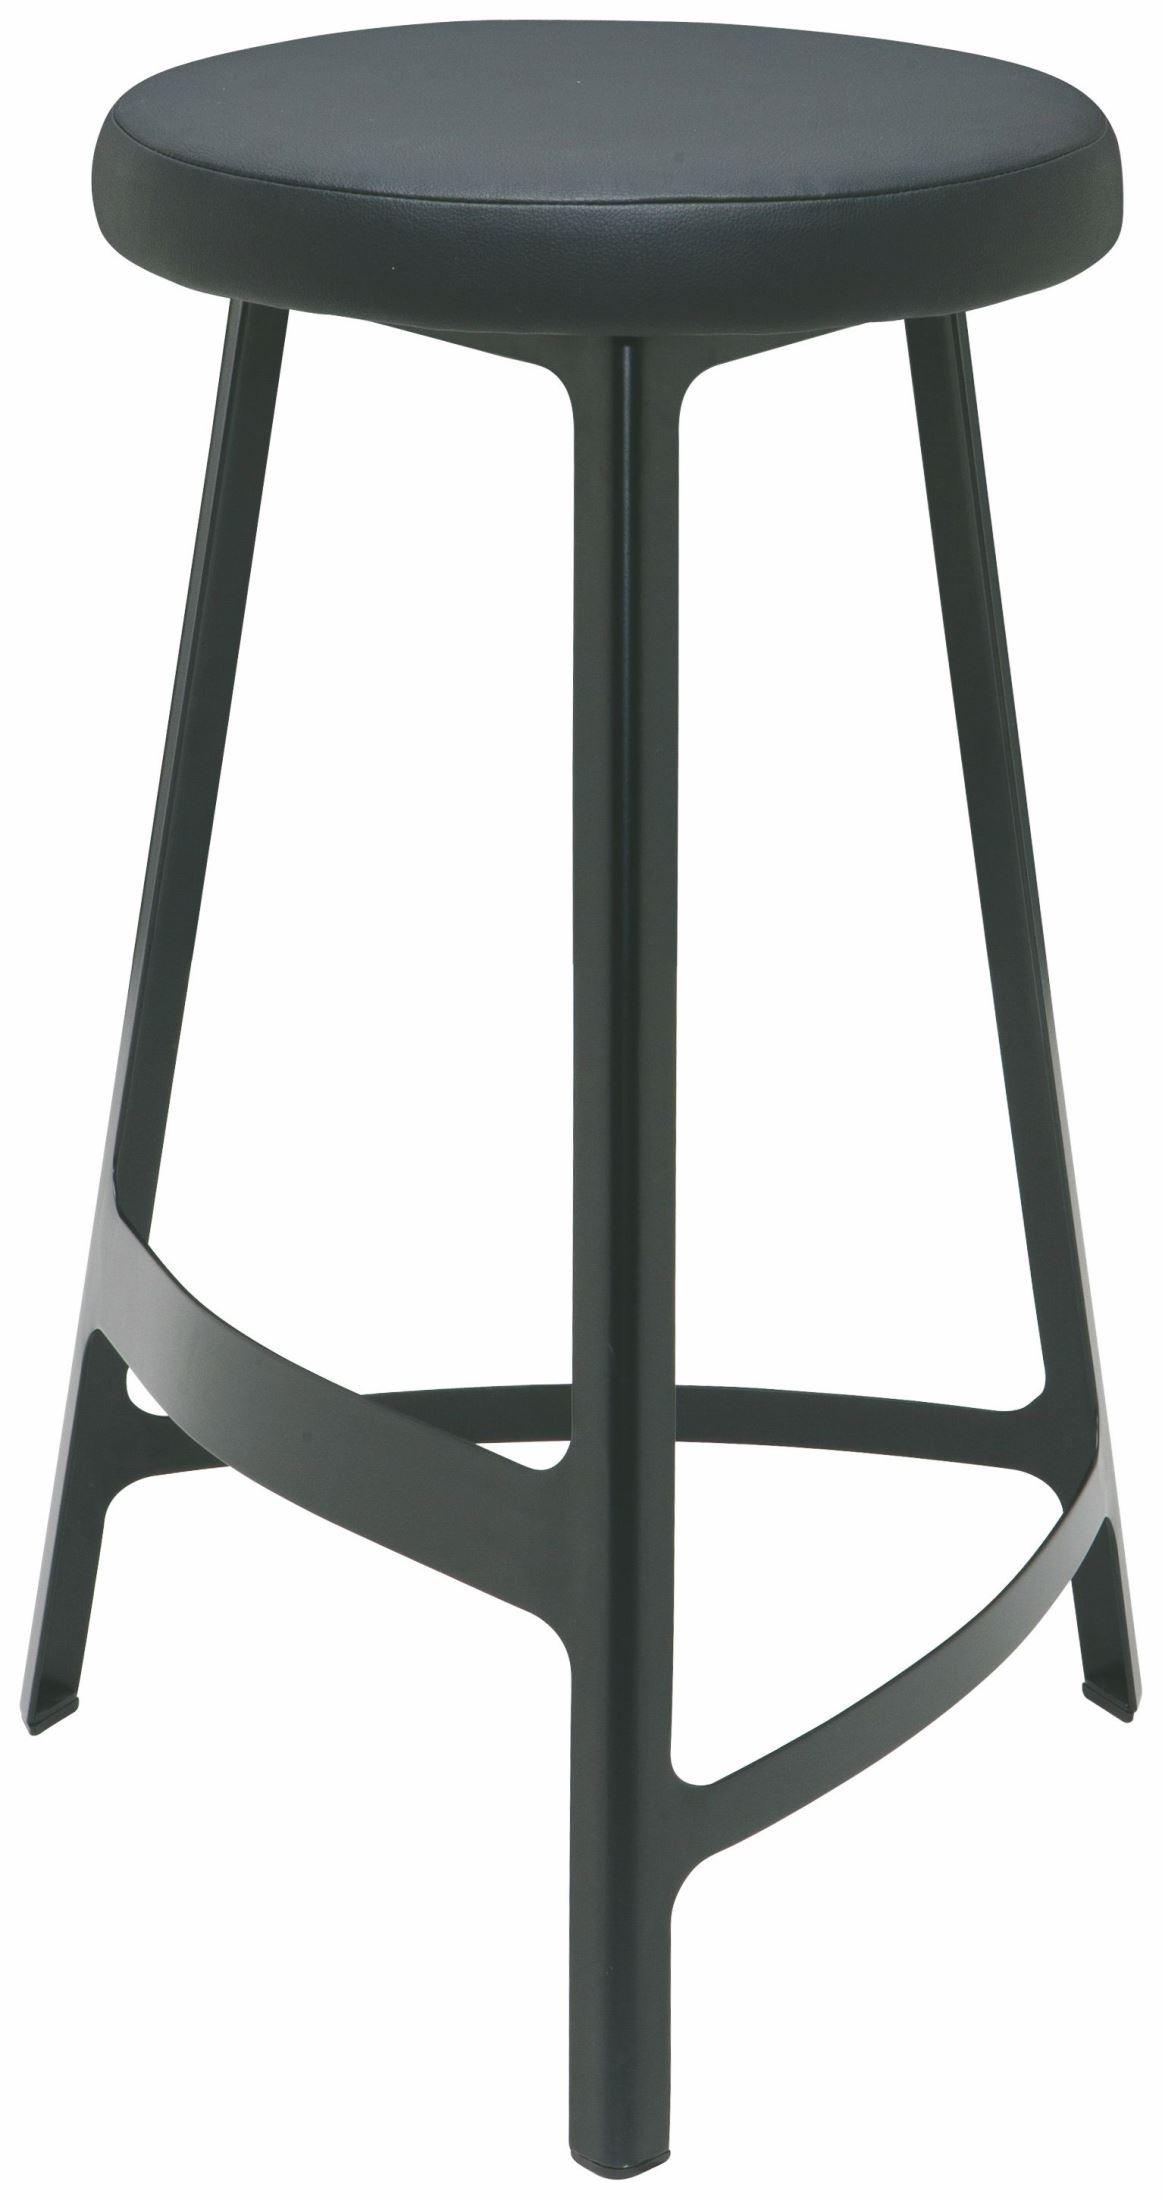 Hyku Black Naugahyde Bar Stool From Nuevo Coleman Furniture